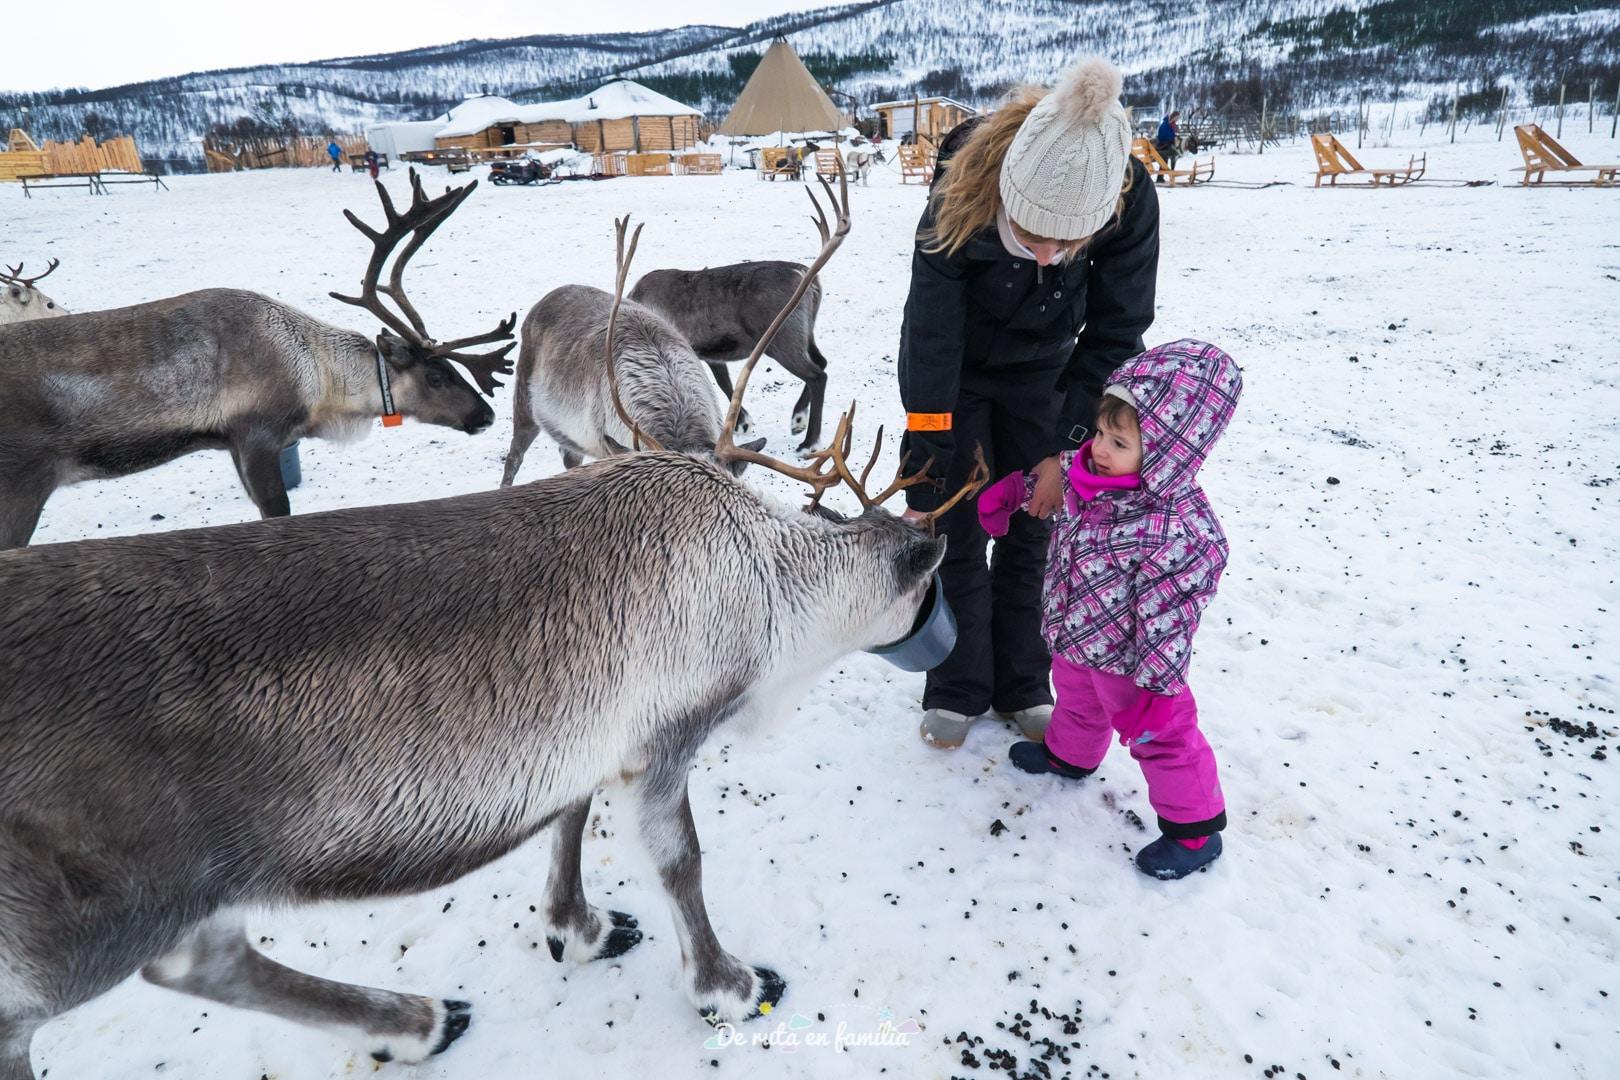 Granja de rens a Tromso